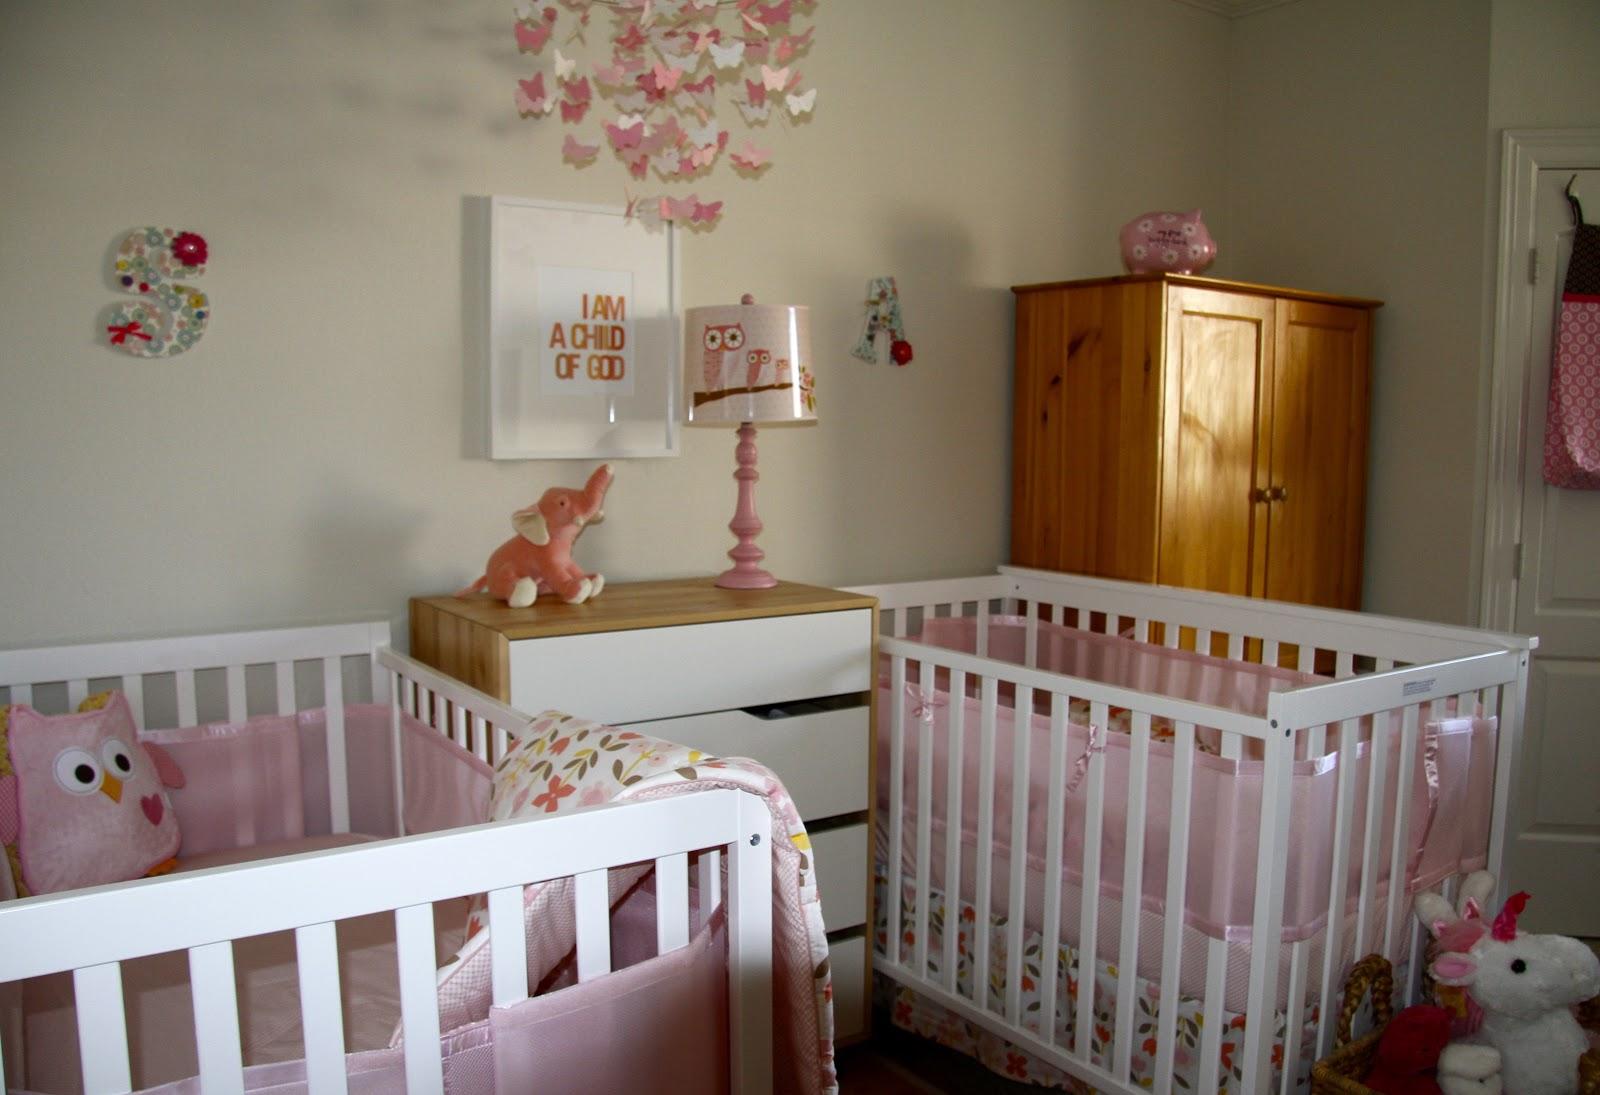 Sherri Cassara Designs: A nursery for twins ... finished!